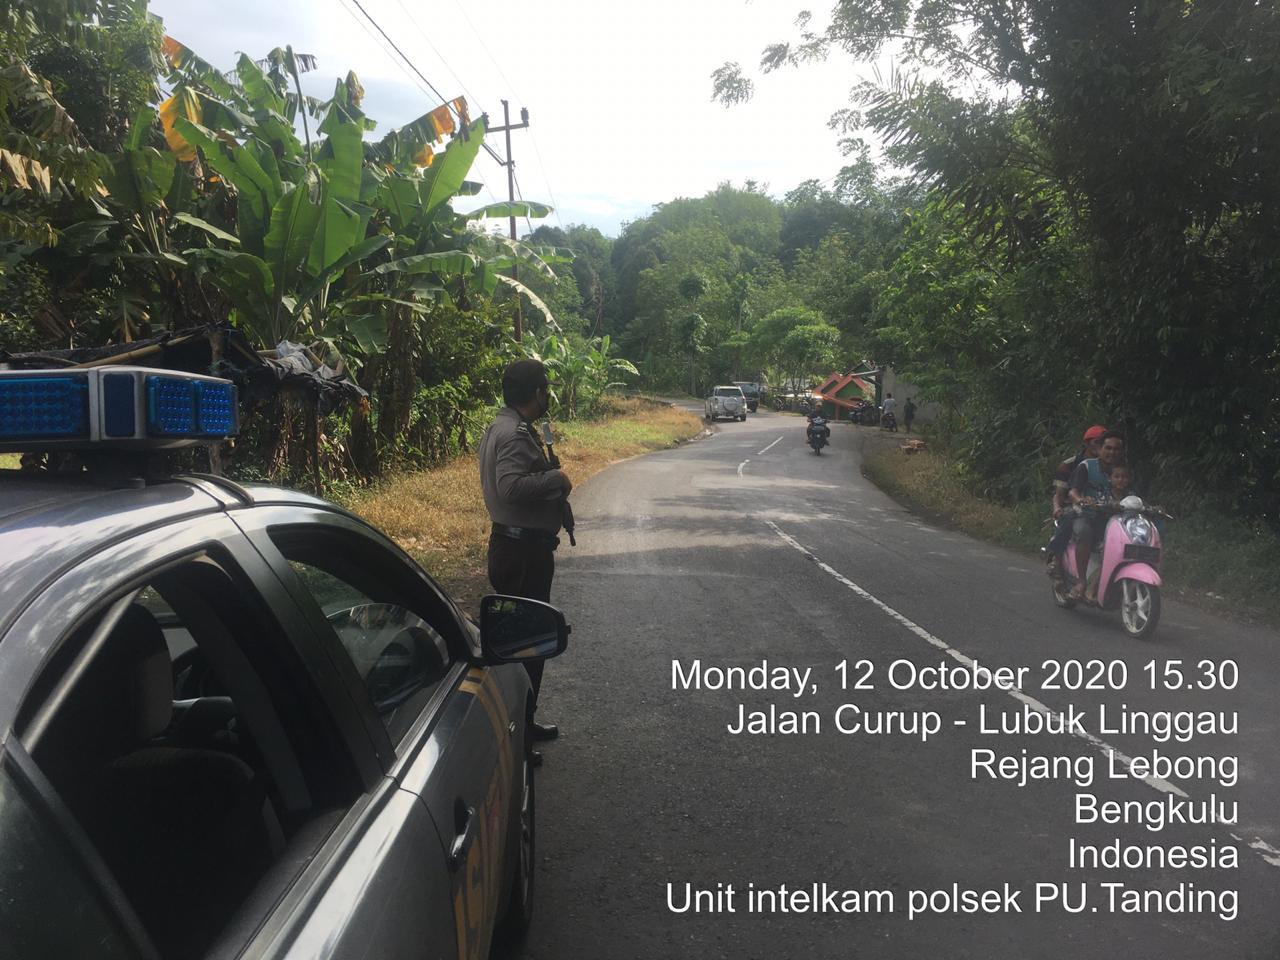 Patroli Polsek Put Di Jalur Lintas Curup Lubuk Linggau